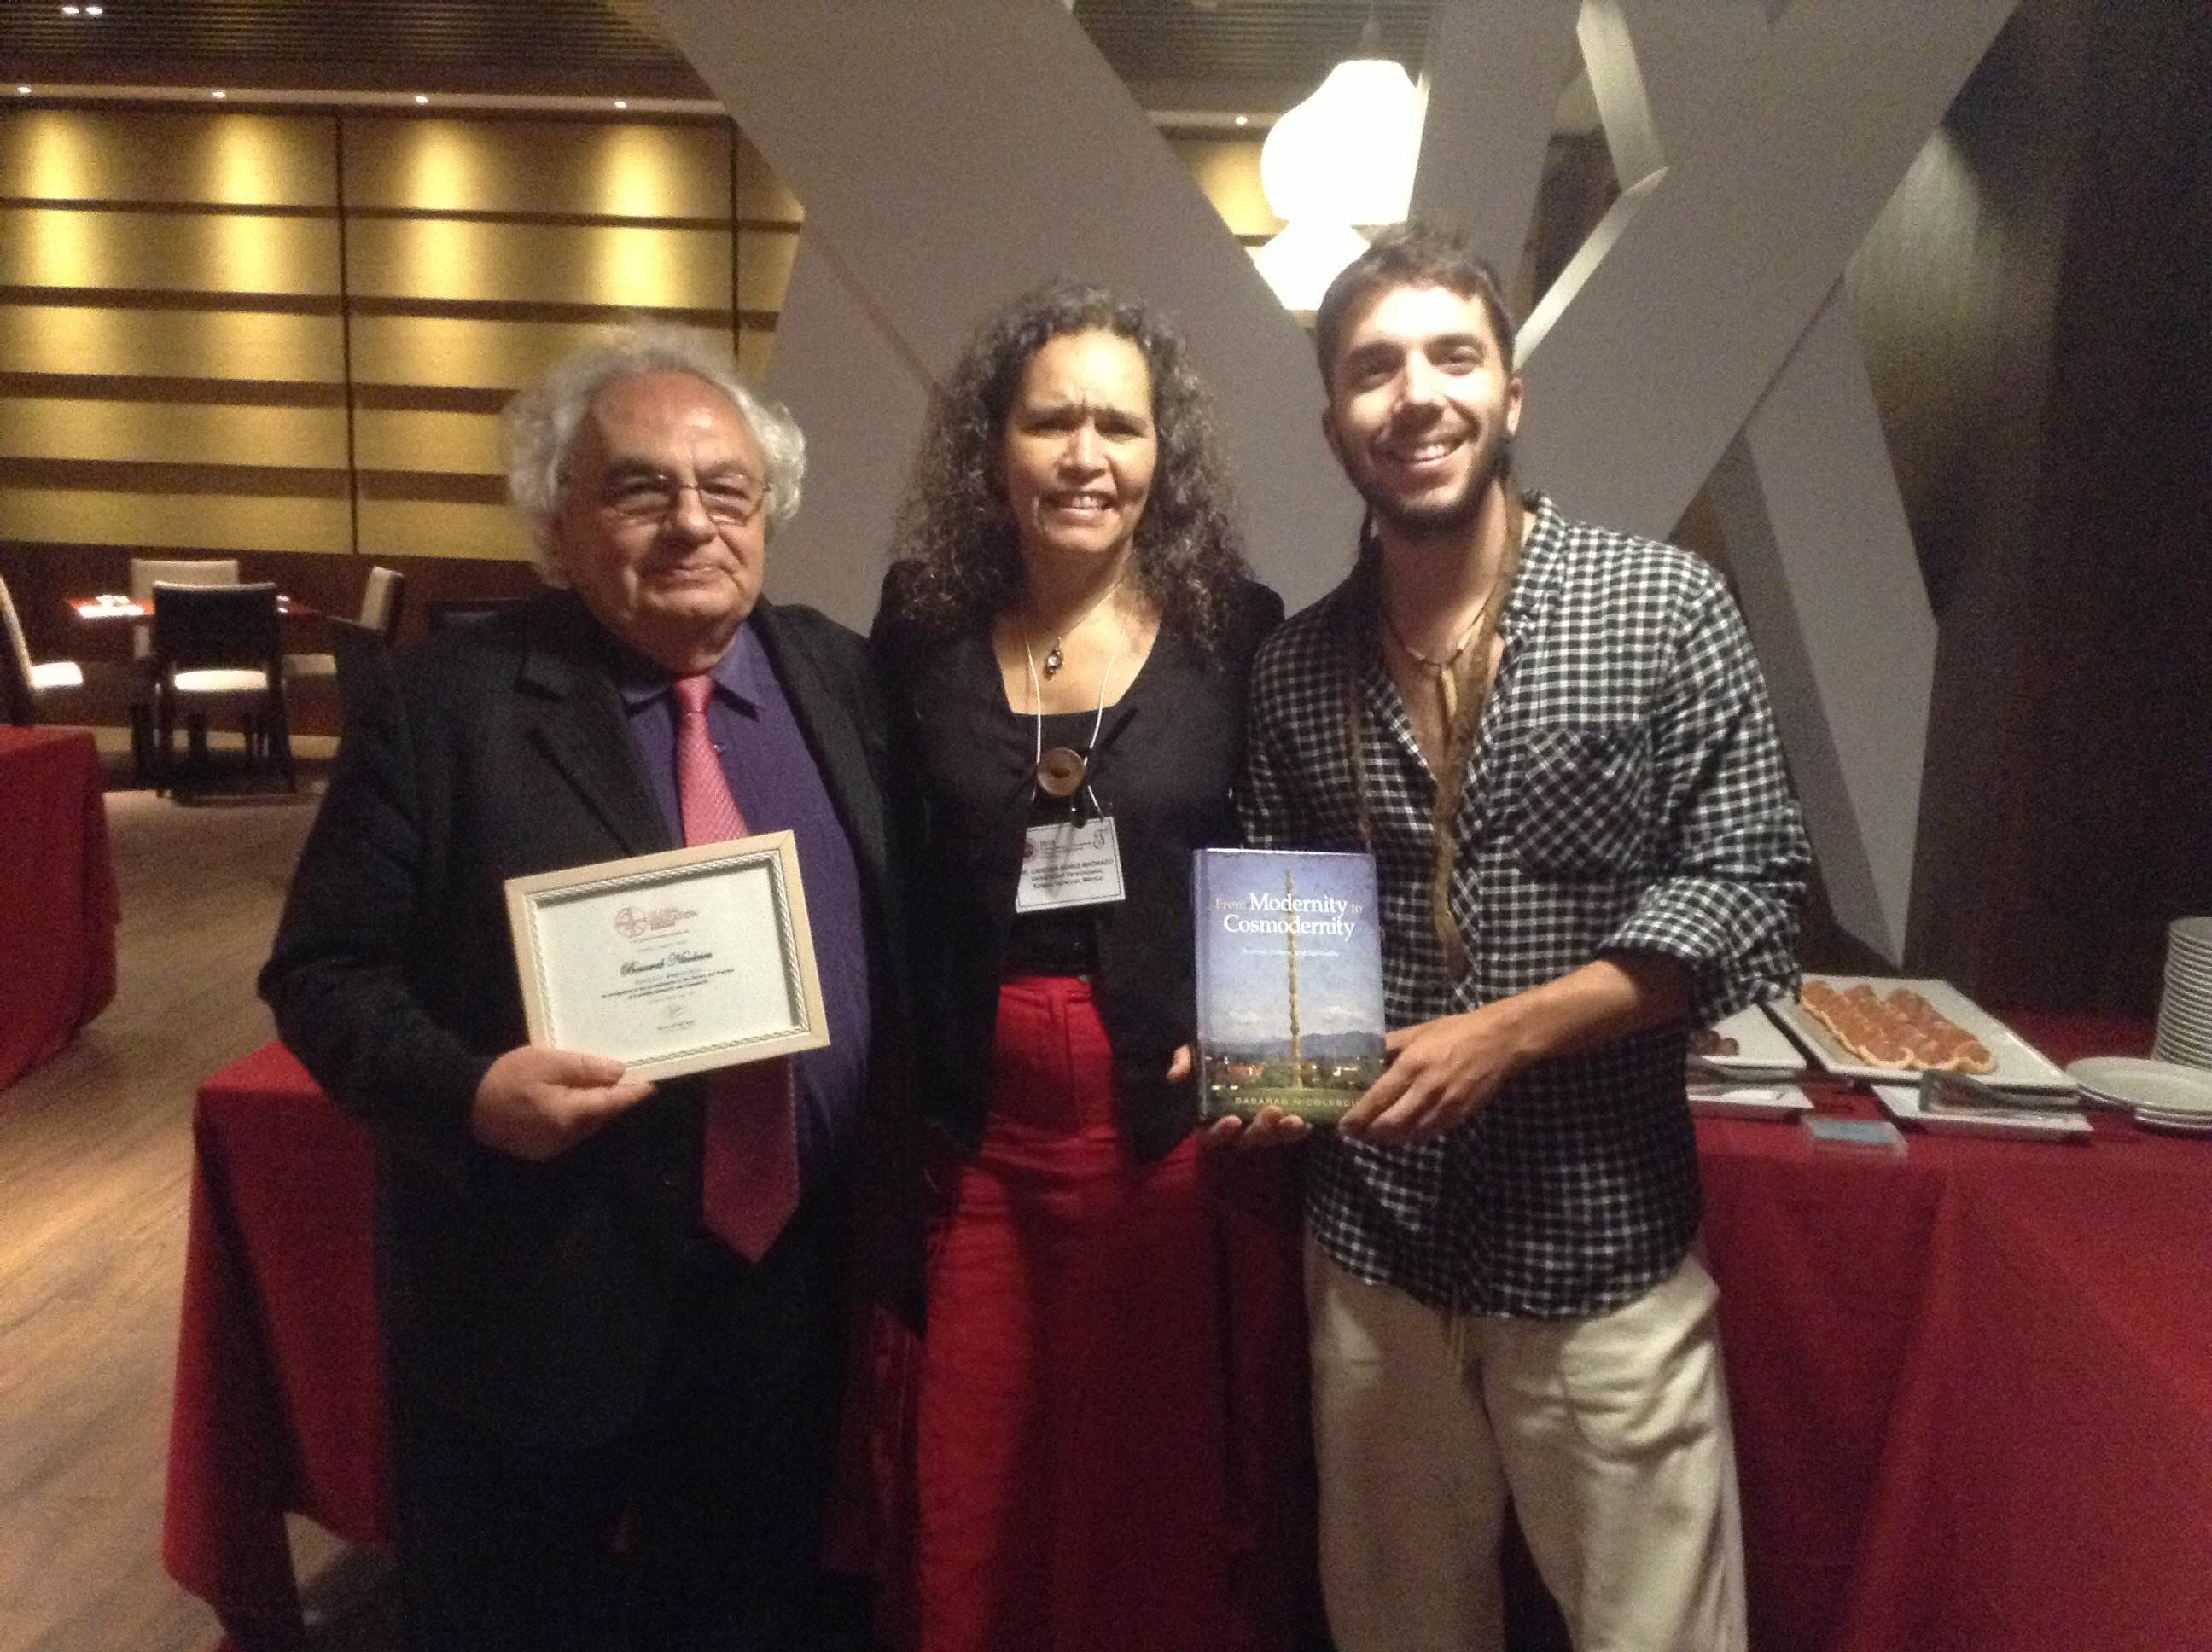 Basarab Nicolescu, Cristina Nunez, Javier Collado, transdisciplinary, ATLAS, UNESCO